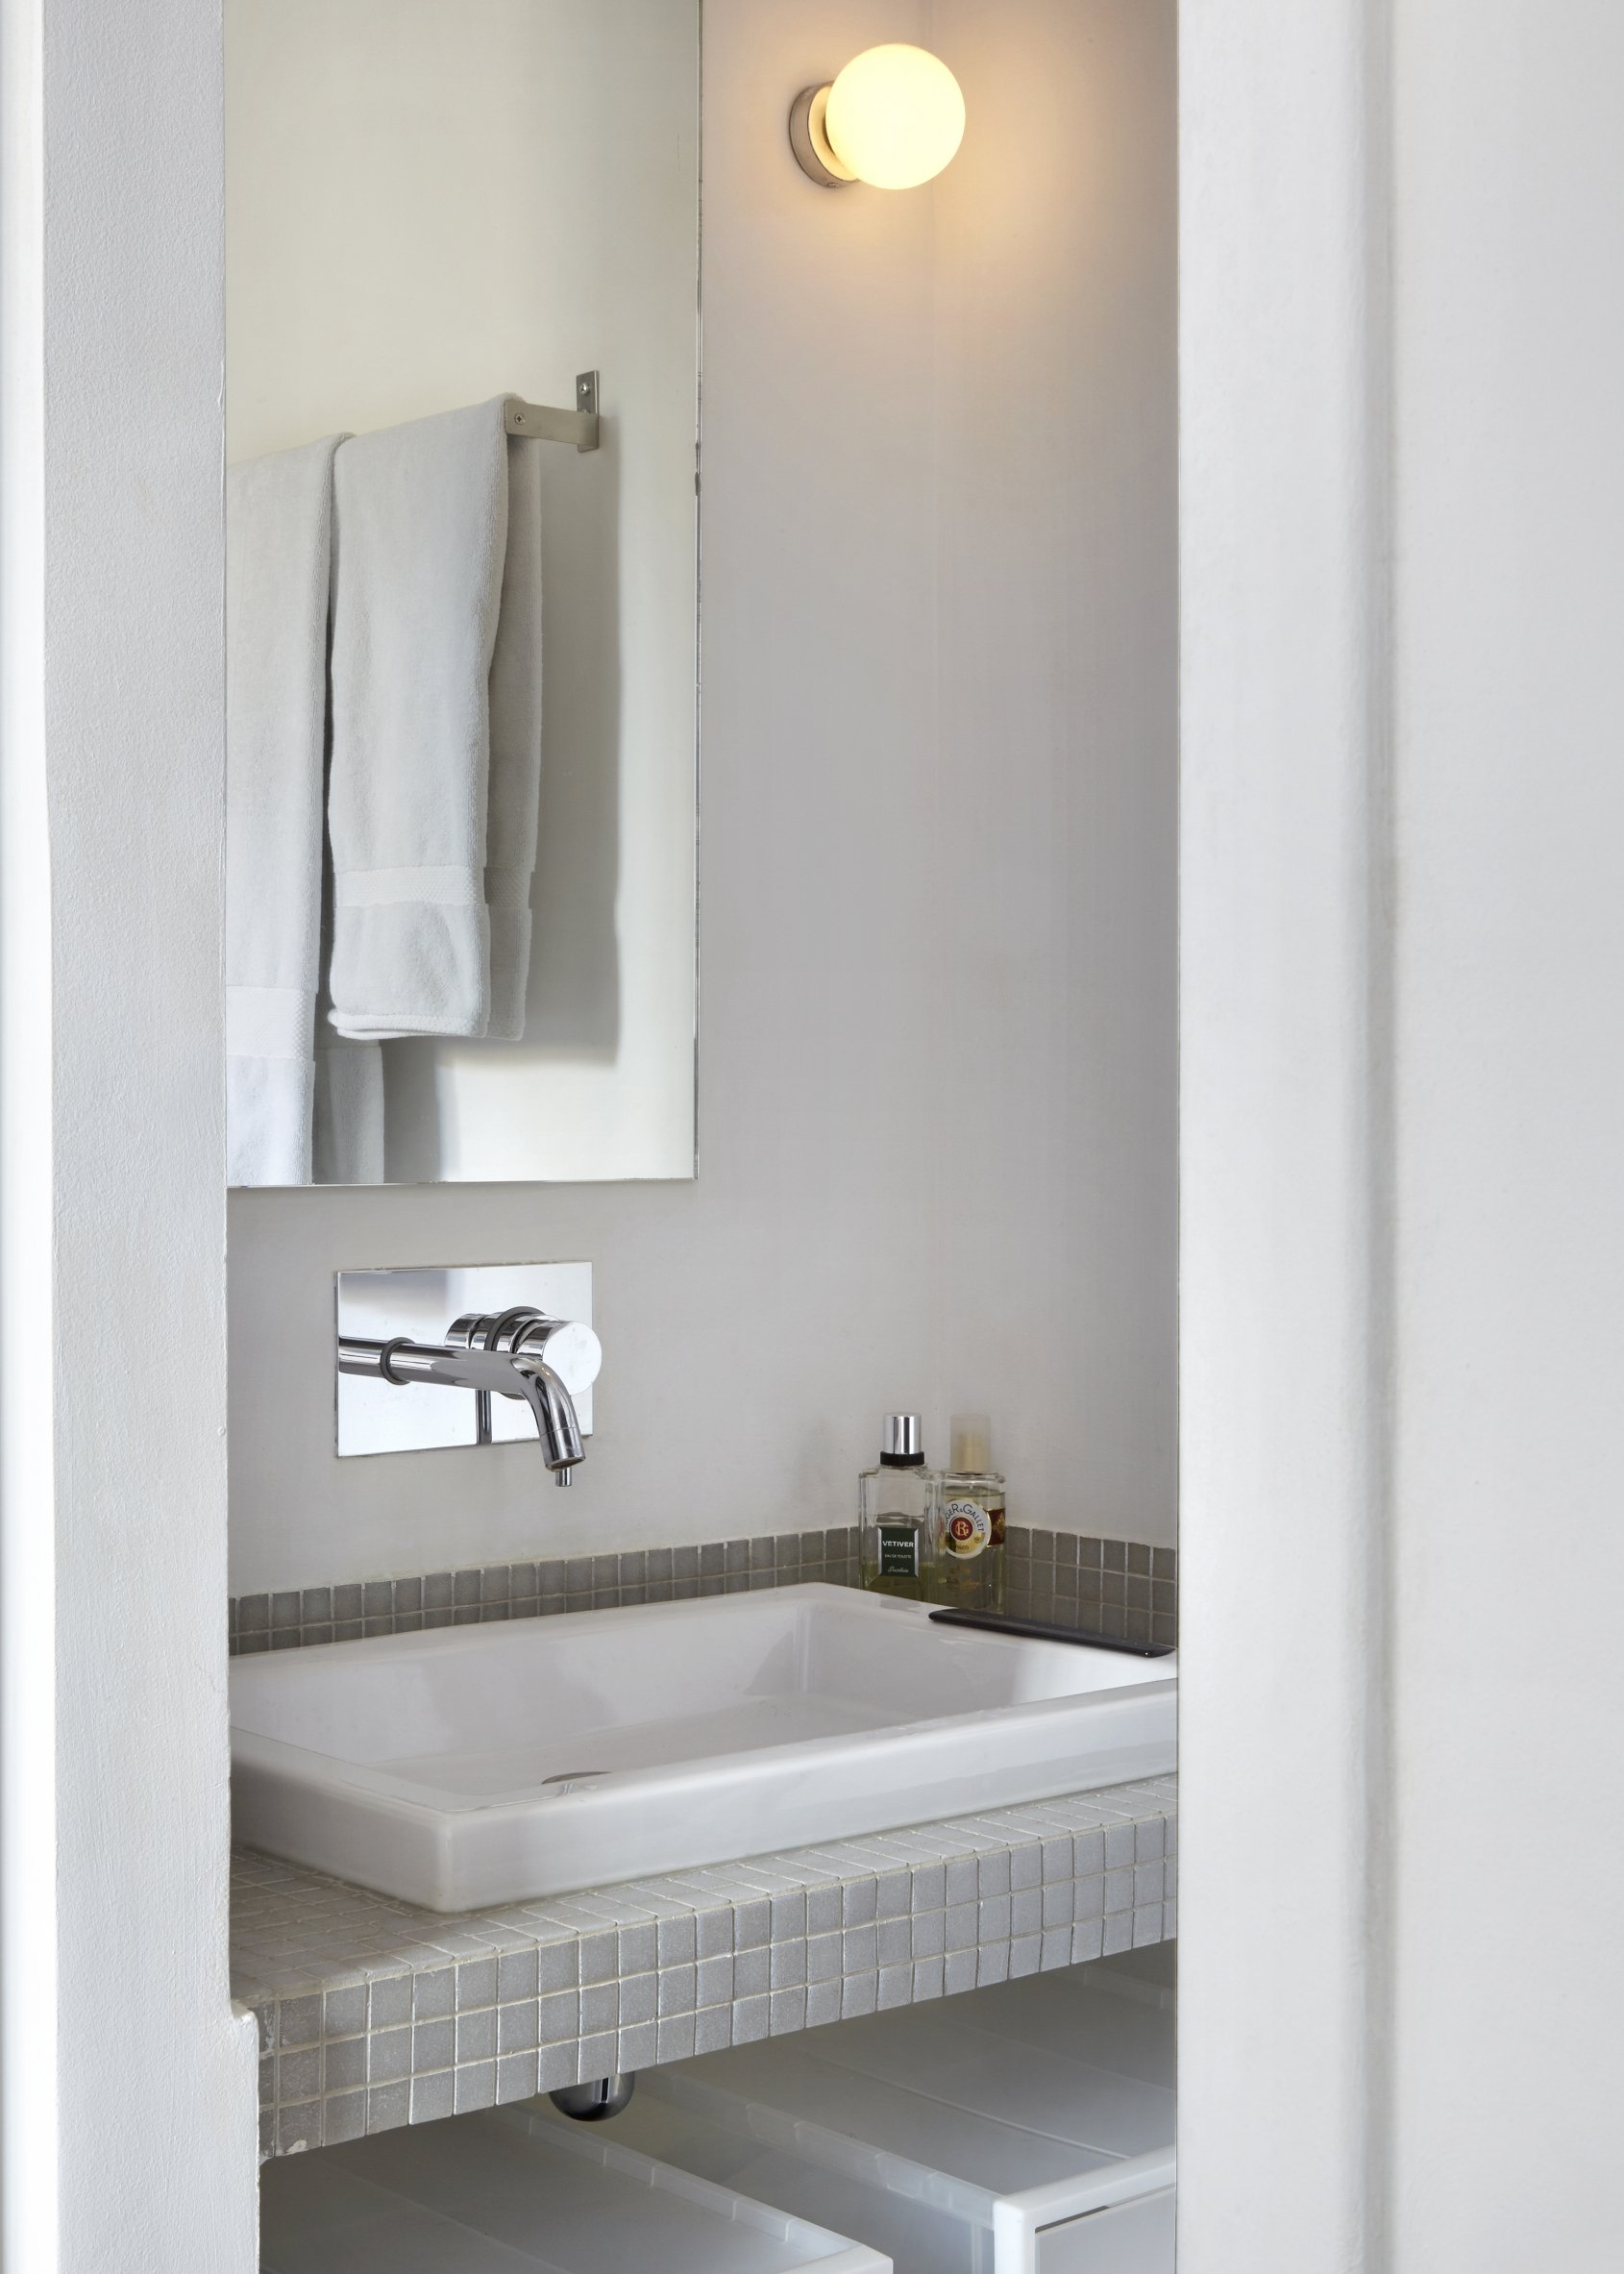 8-salle-de-bains.jpg